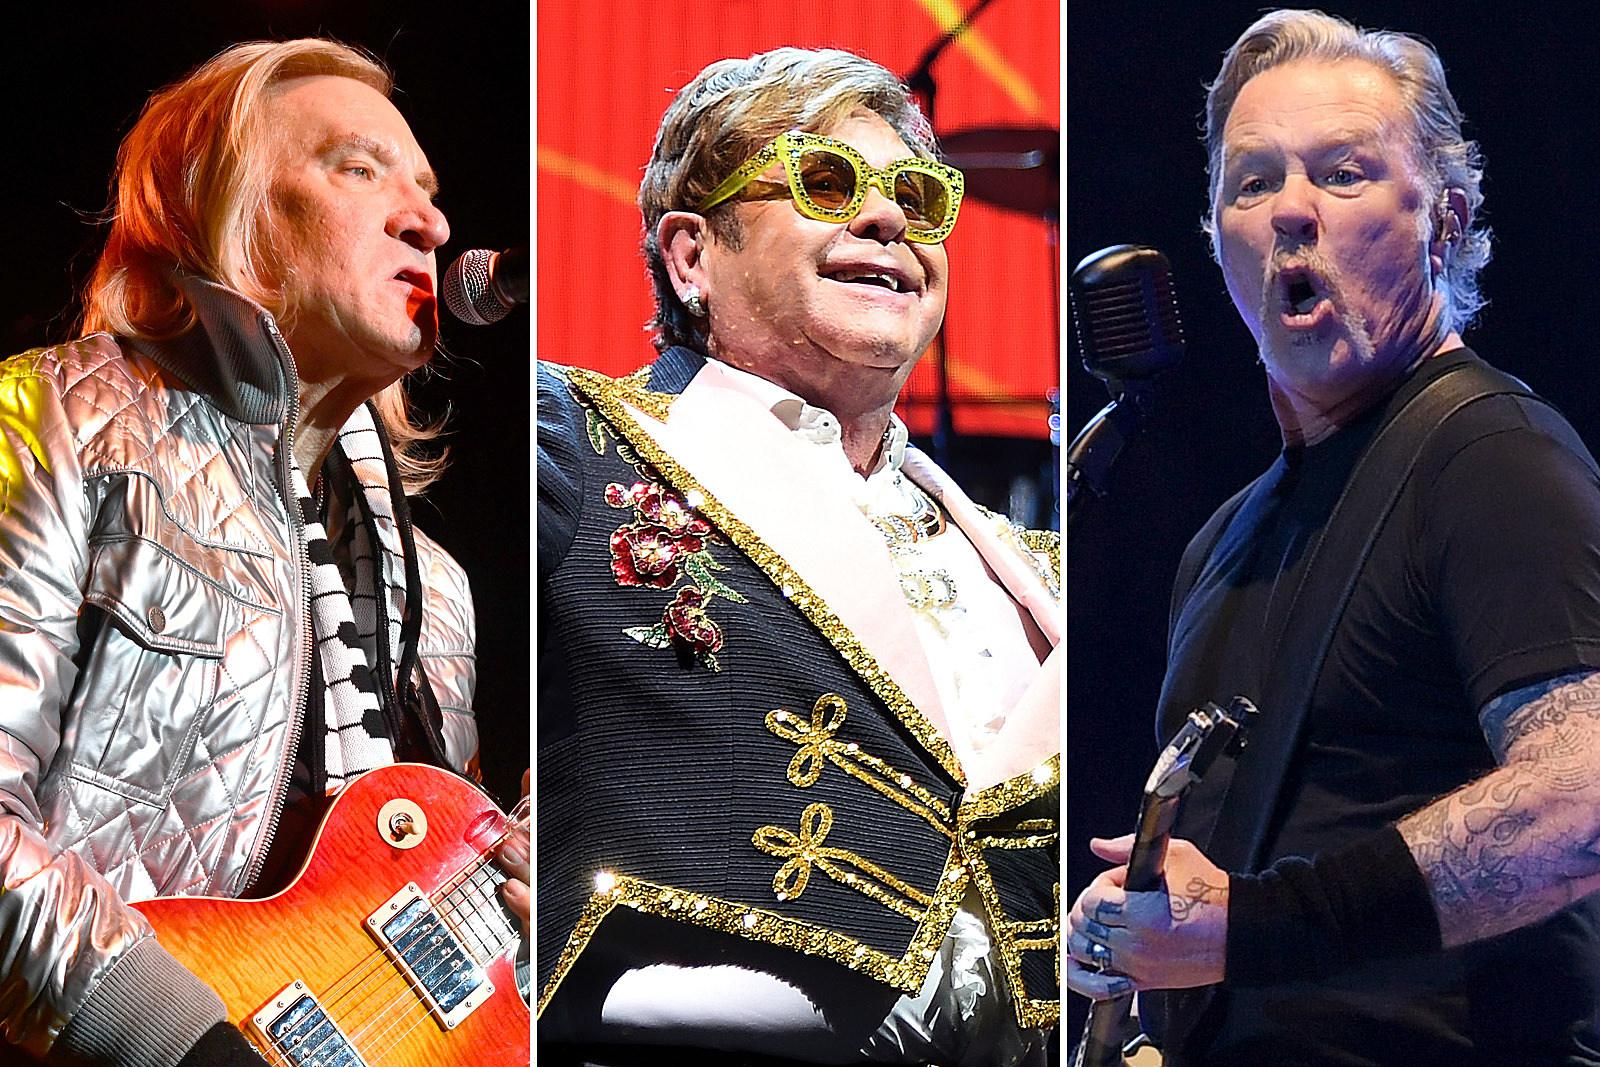 Eagles, Elton John, Metallica Lead Forbes' Top Rock Earners